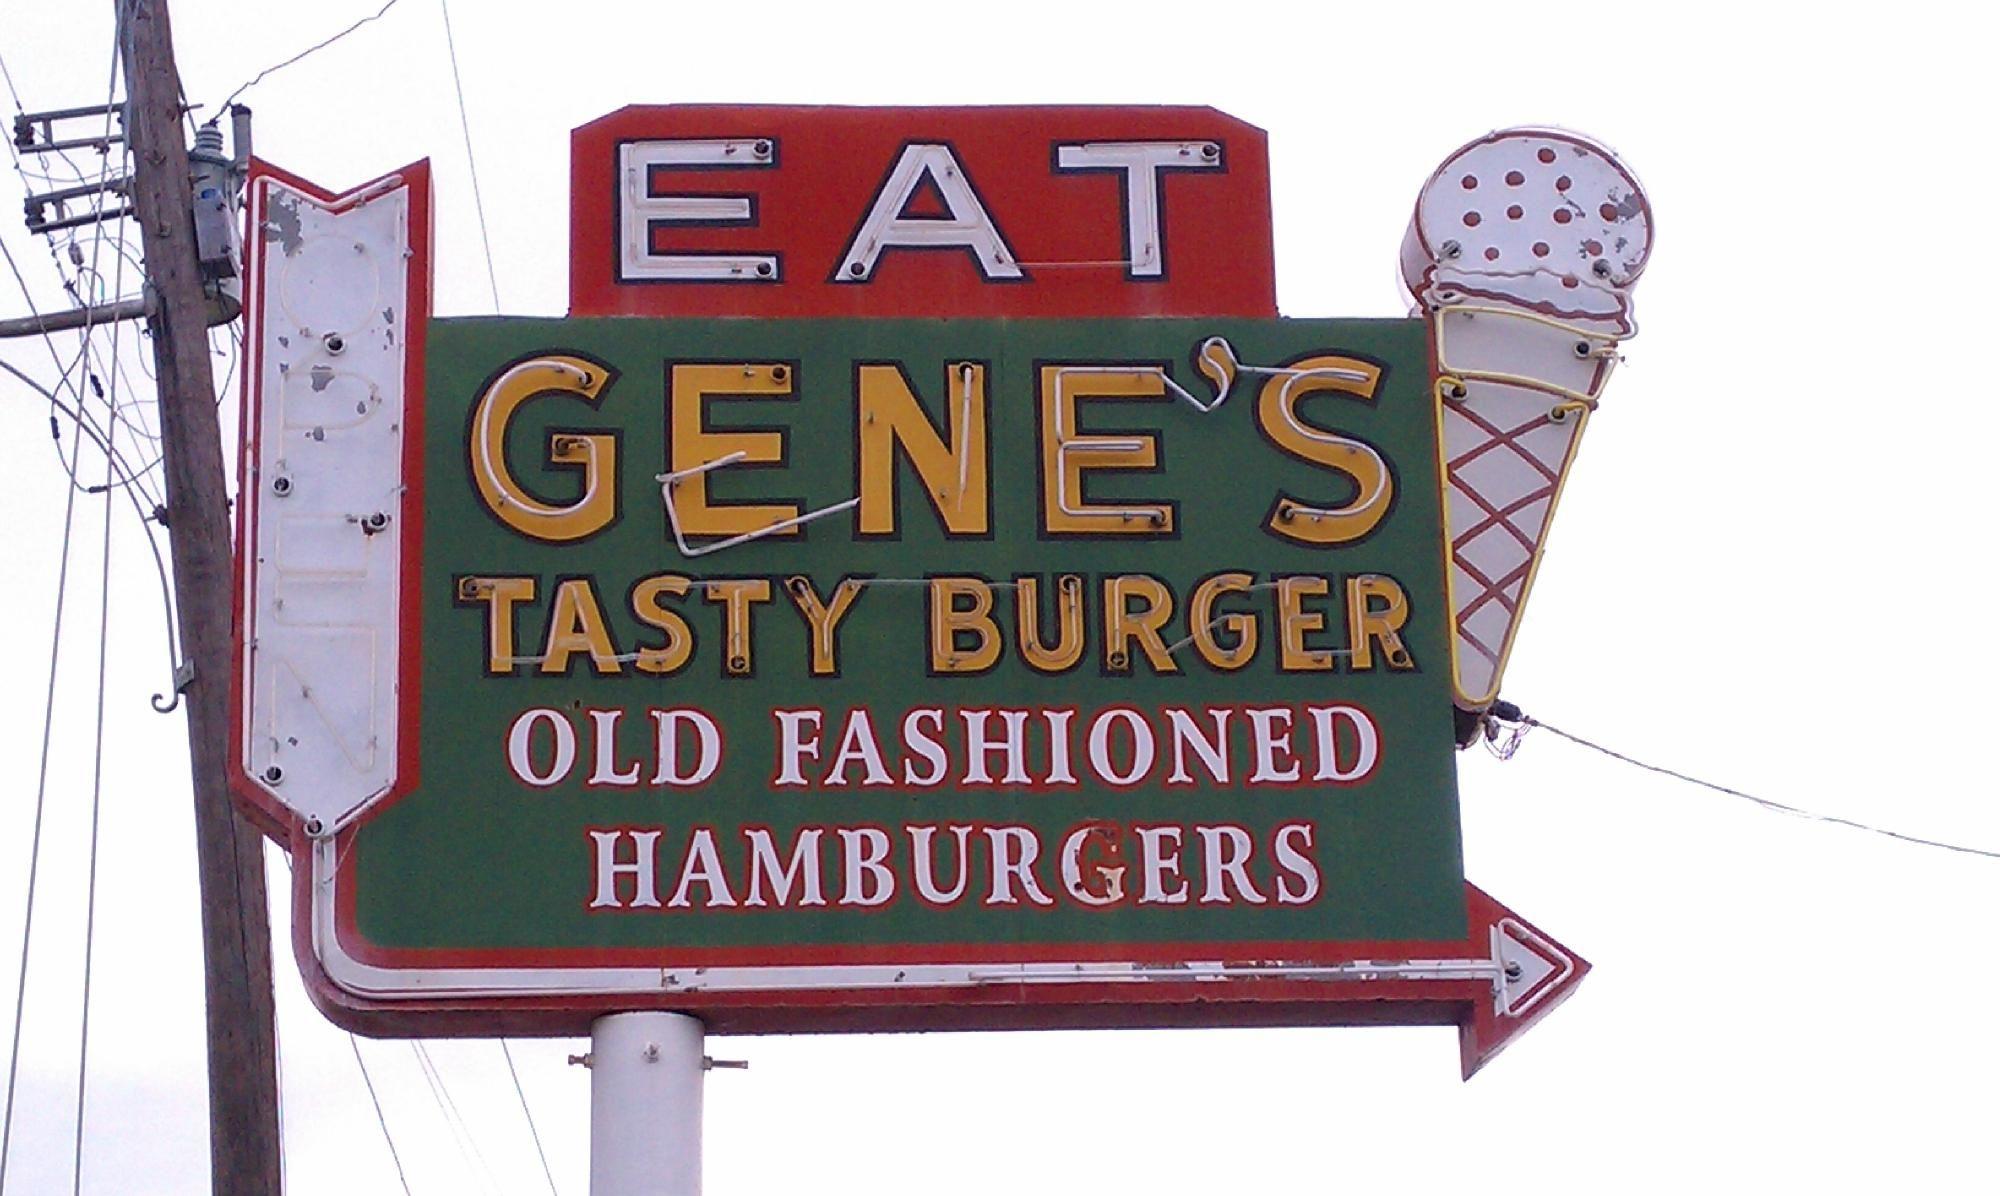 Genes tasty burger wichita falls delicious burgers